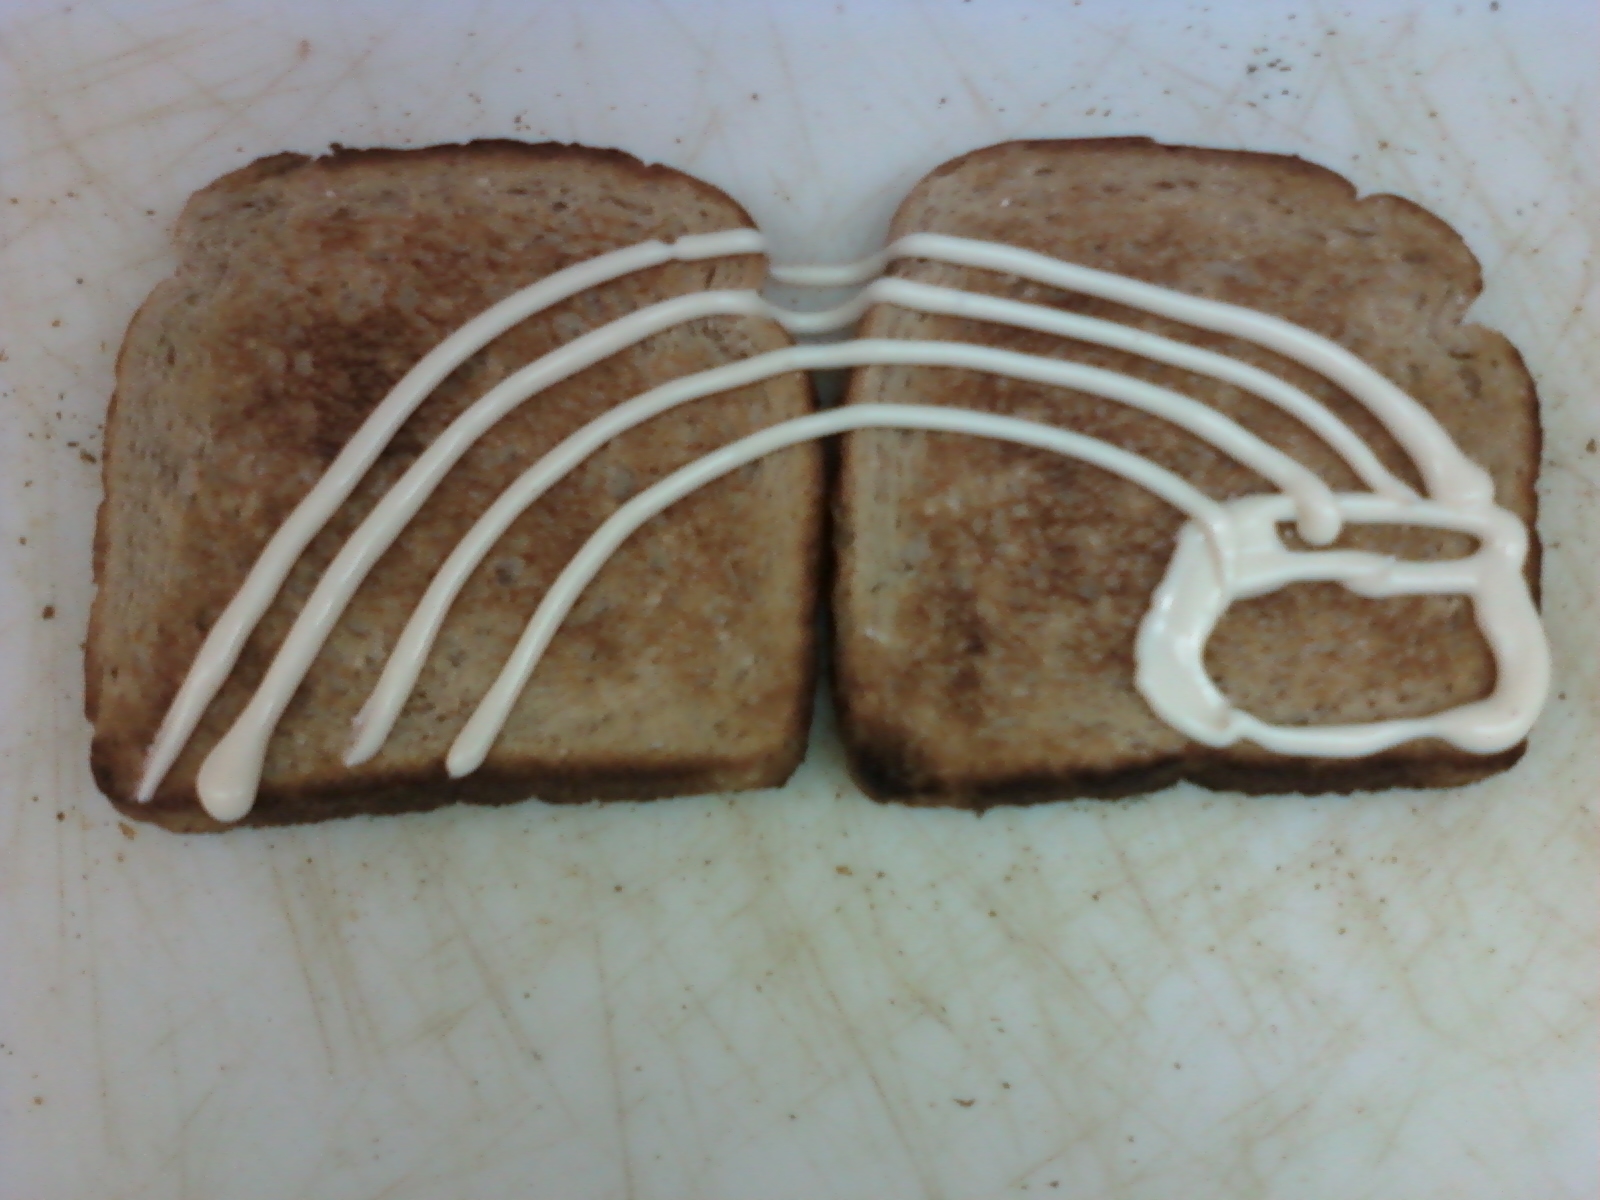 sandwich_art/0809110916.jpg